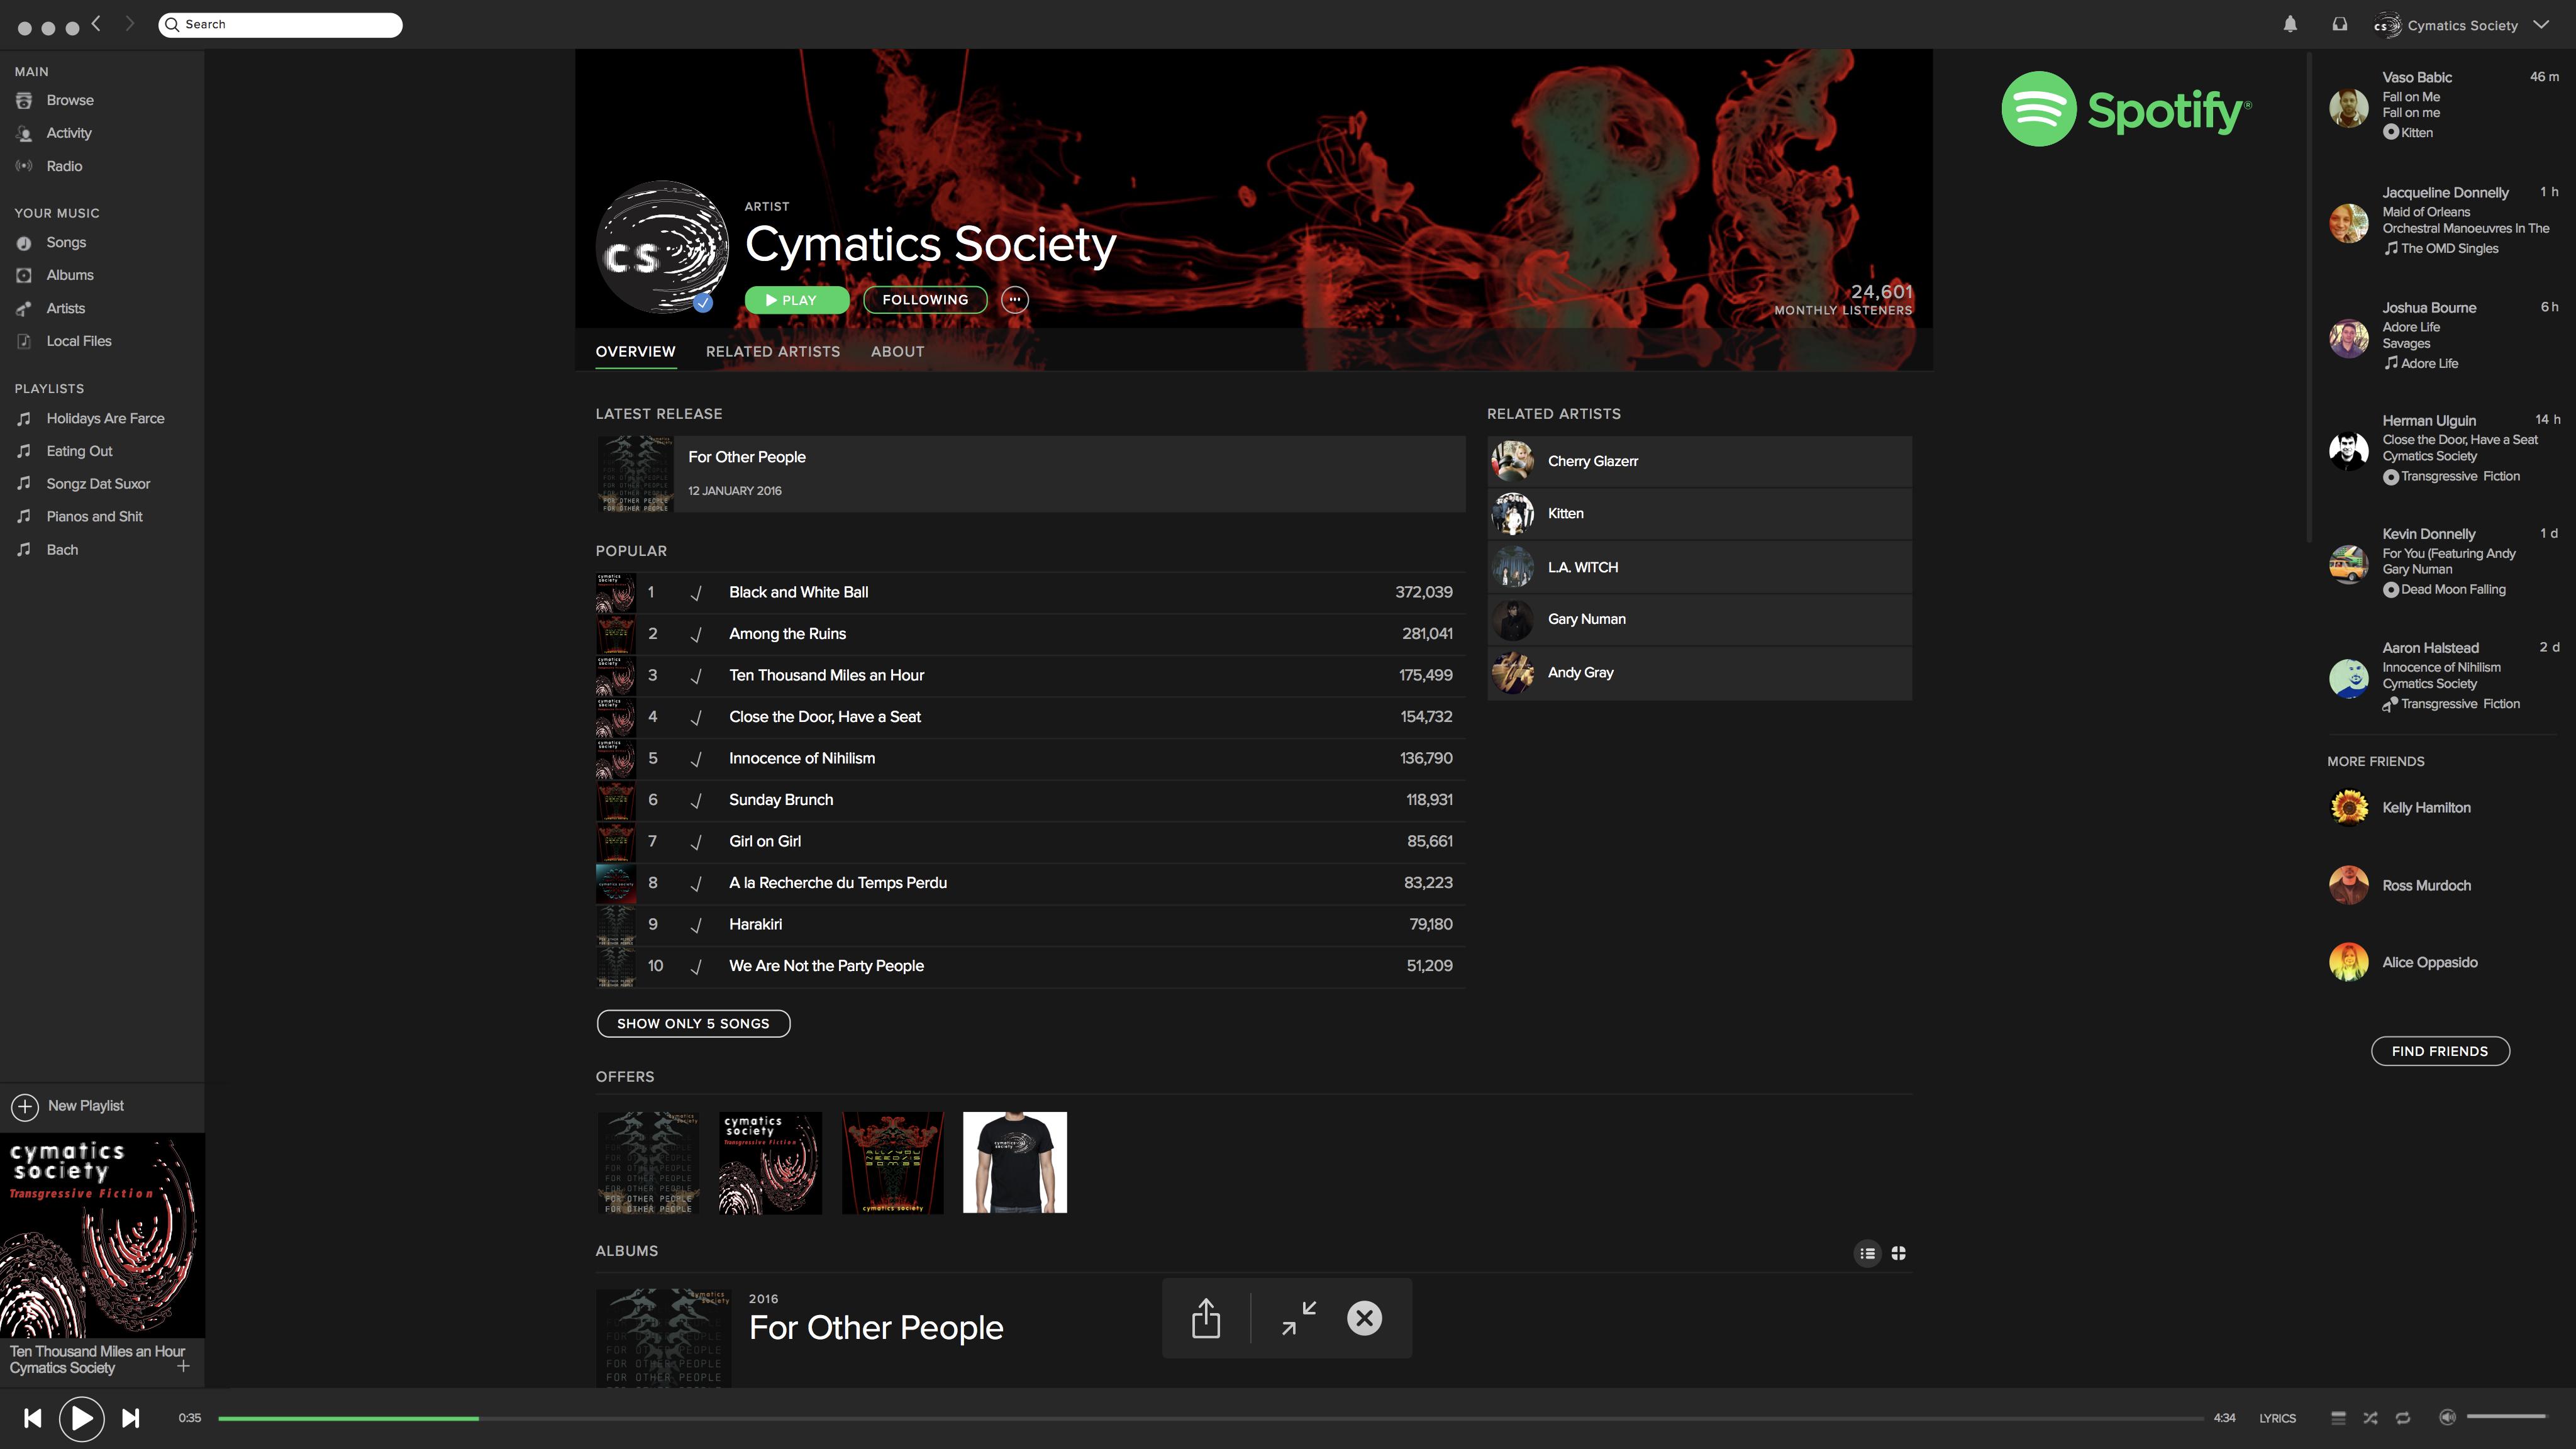 Spotify Artist Page